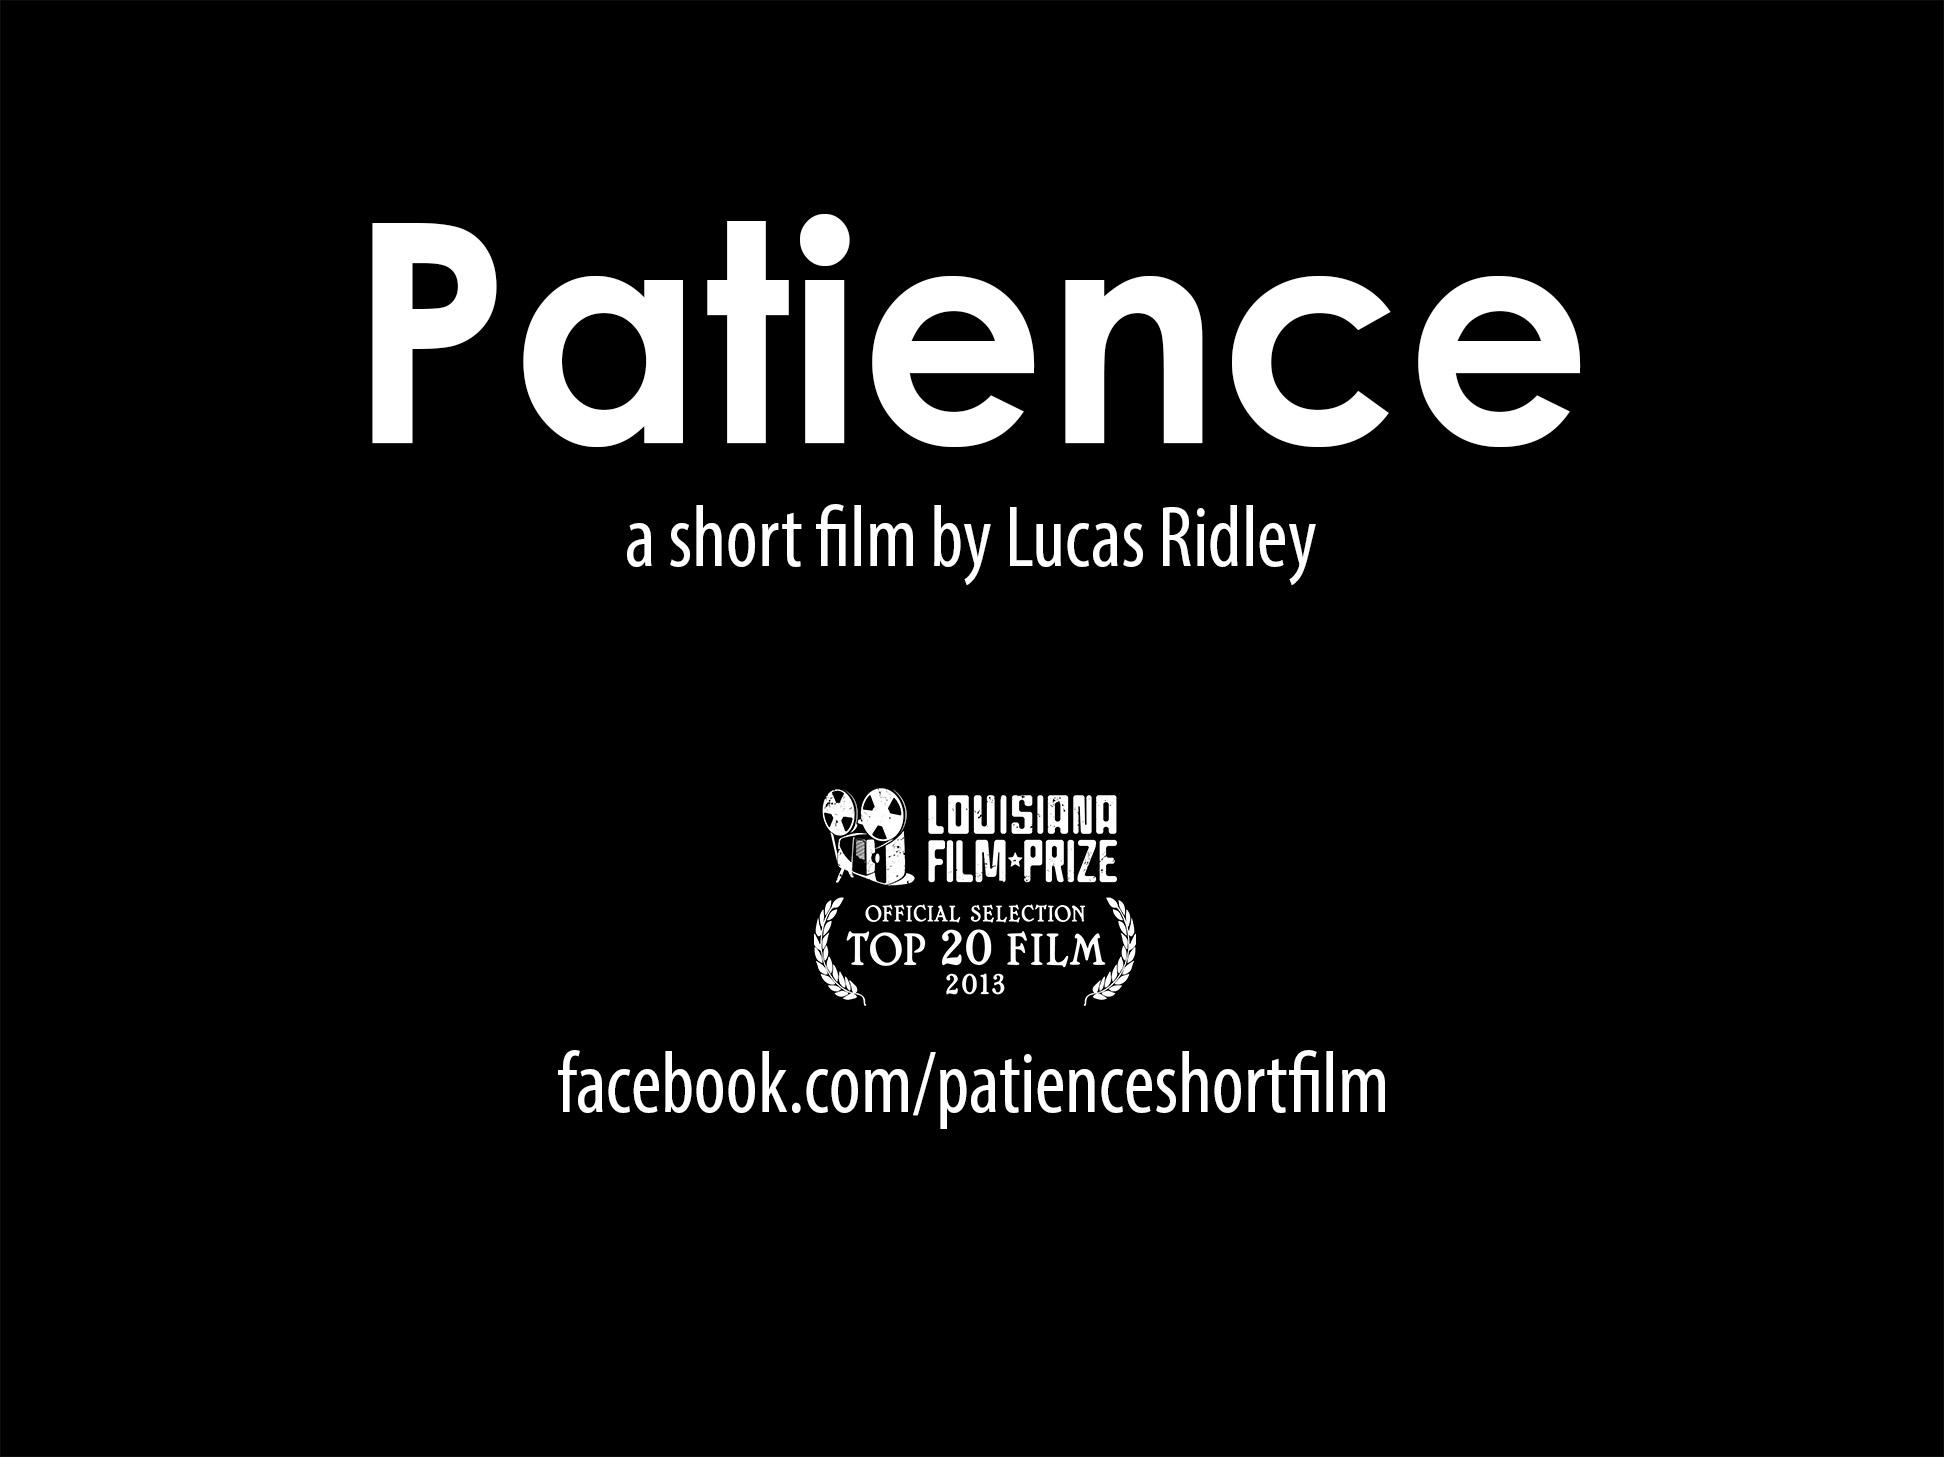 Patience short film trailer